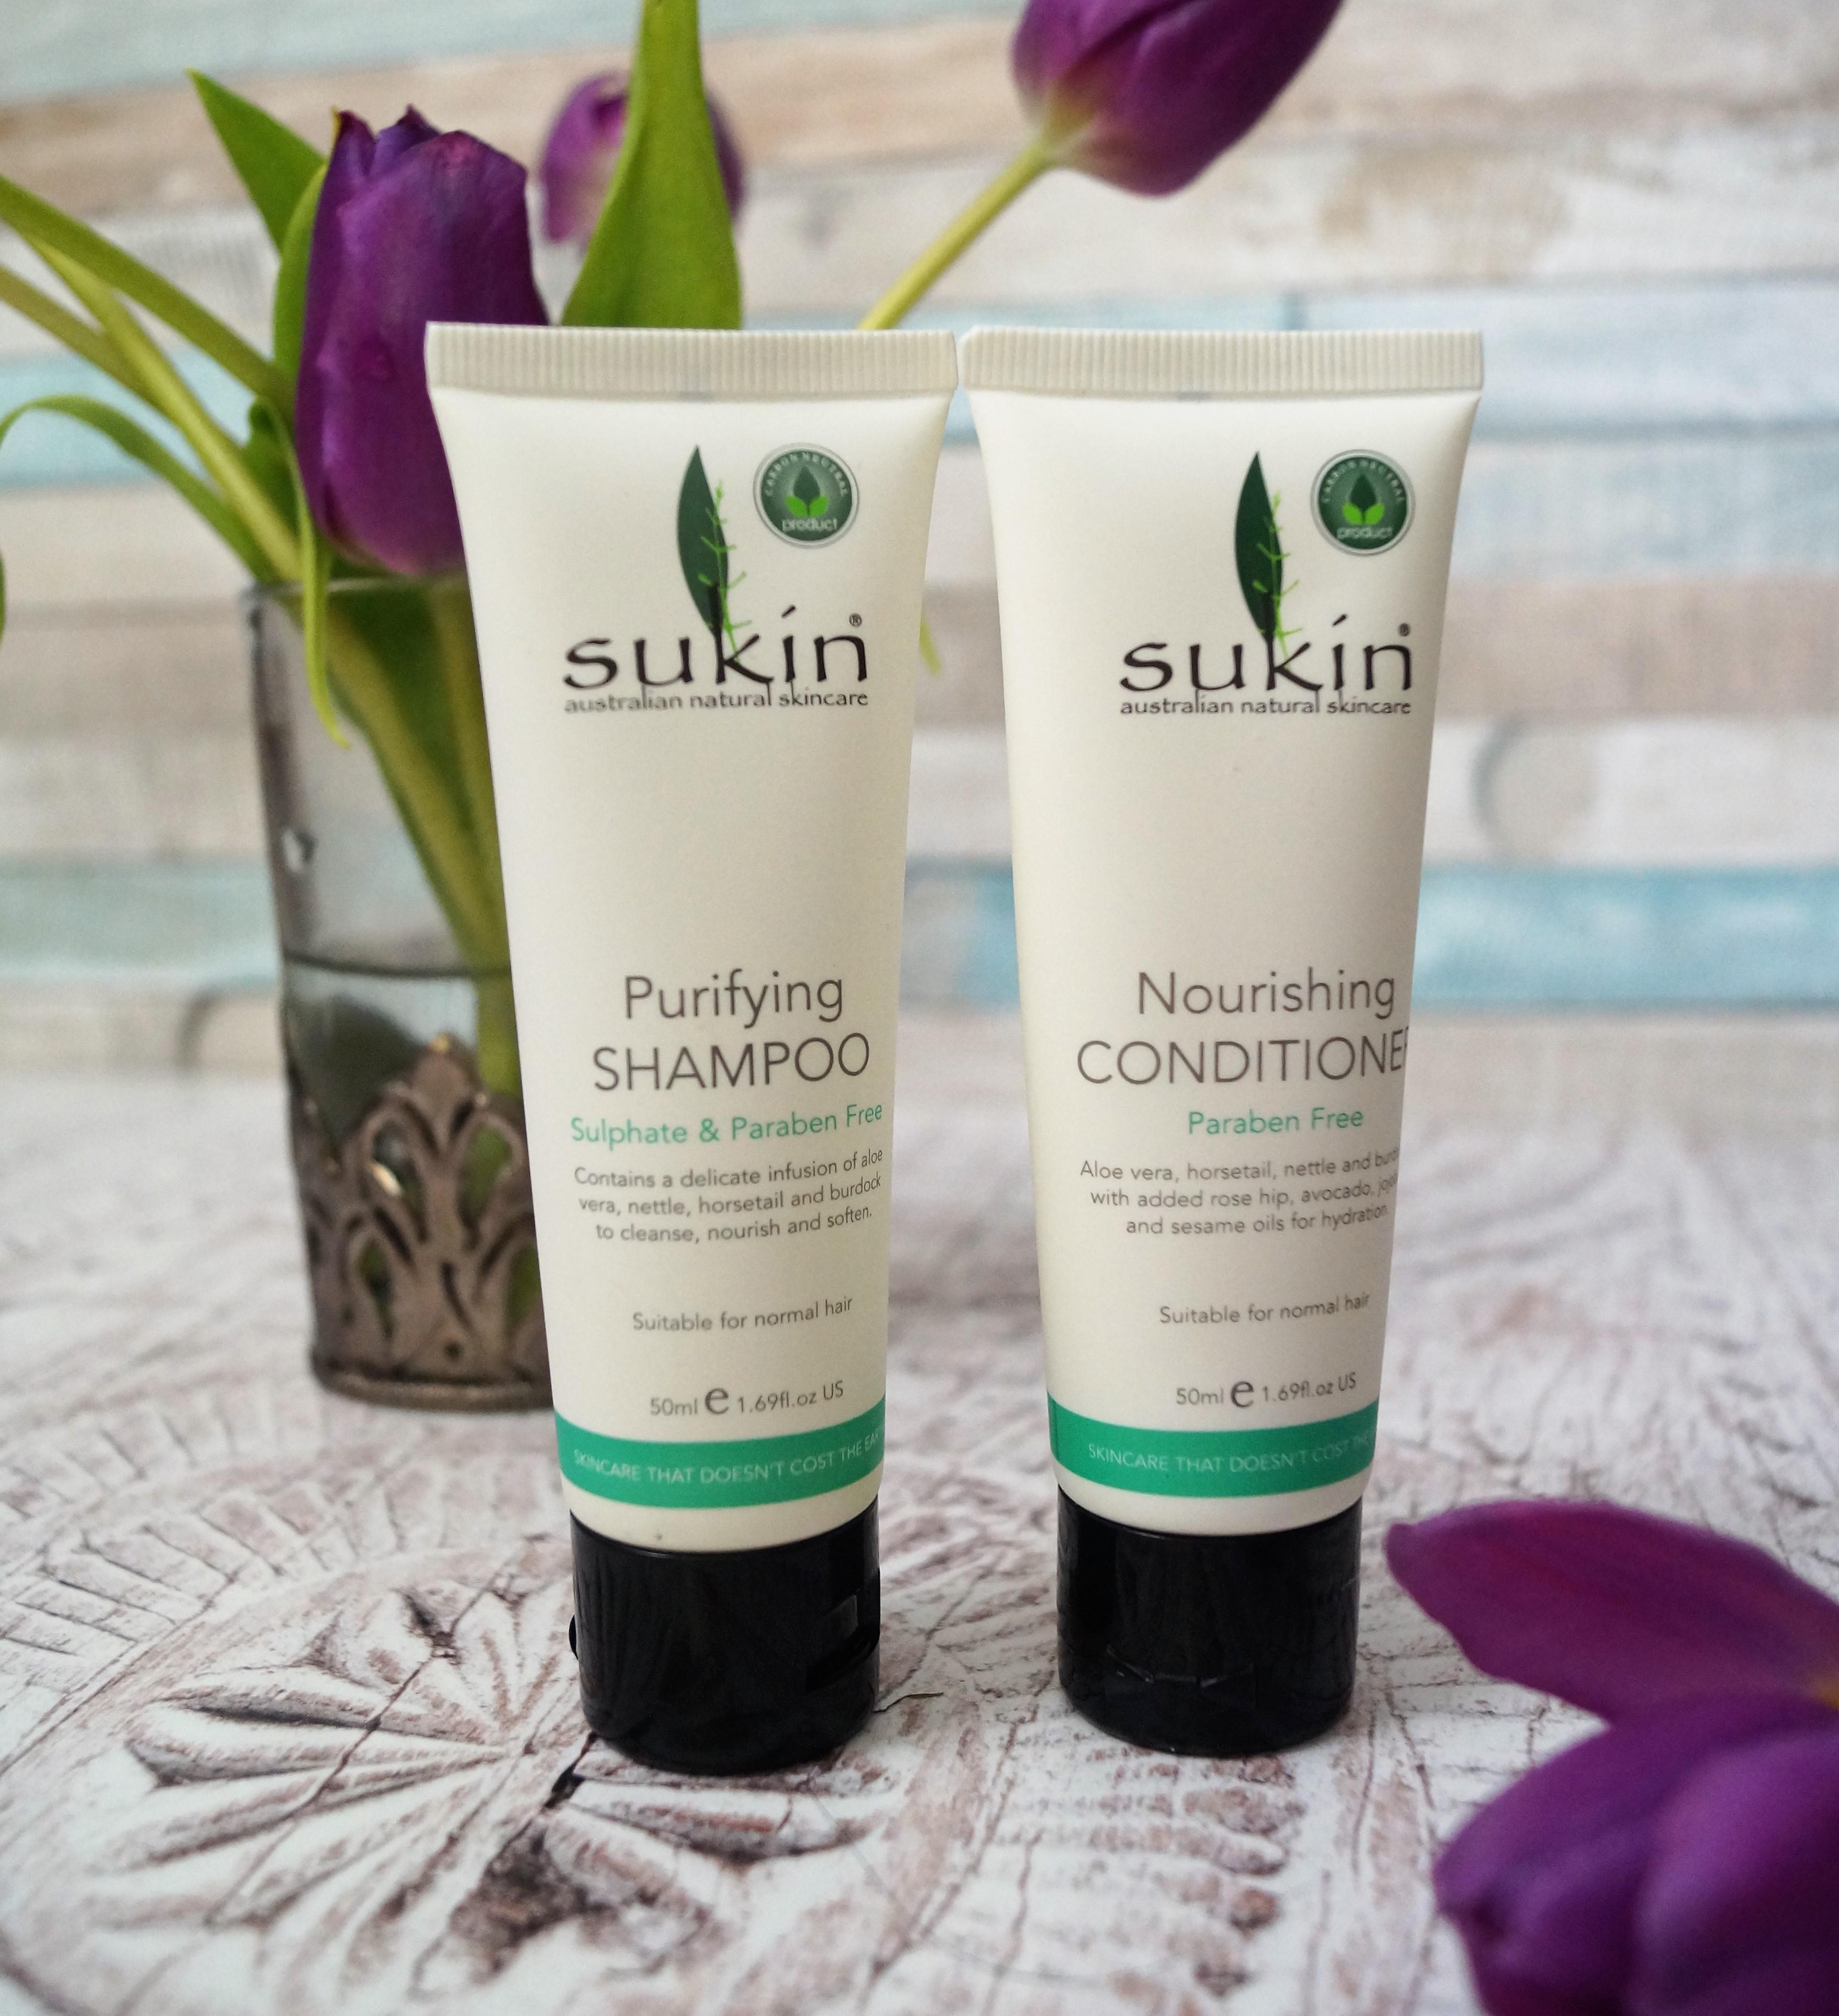 Sukin shampoo and conditioner